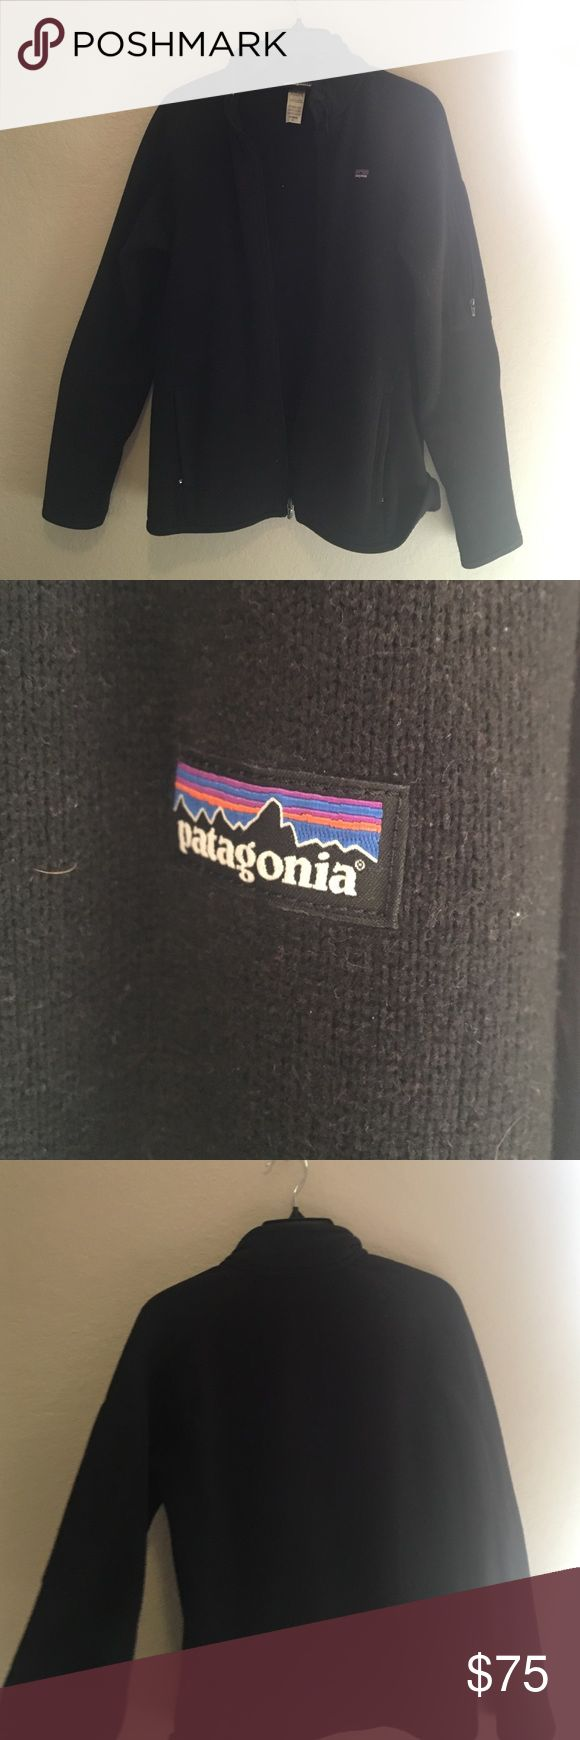 Patagonia Better Sweater Jacket Black fleece full zip jacket. No good. Patagonia. Patagonia Jackets & Coats